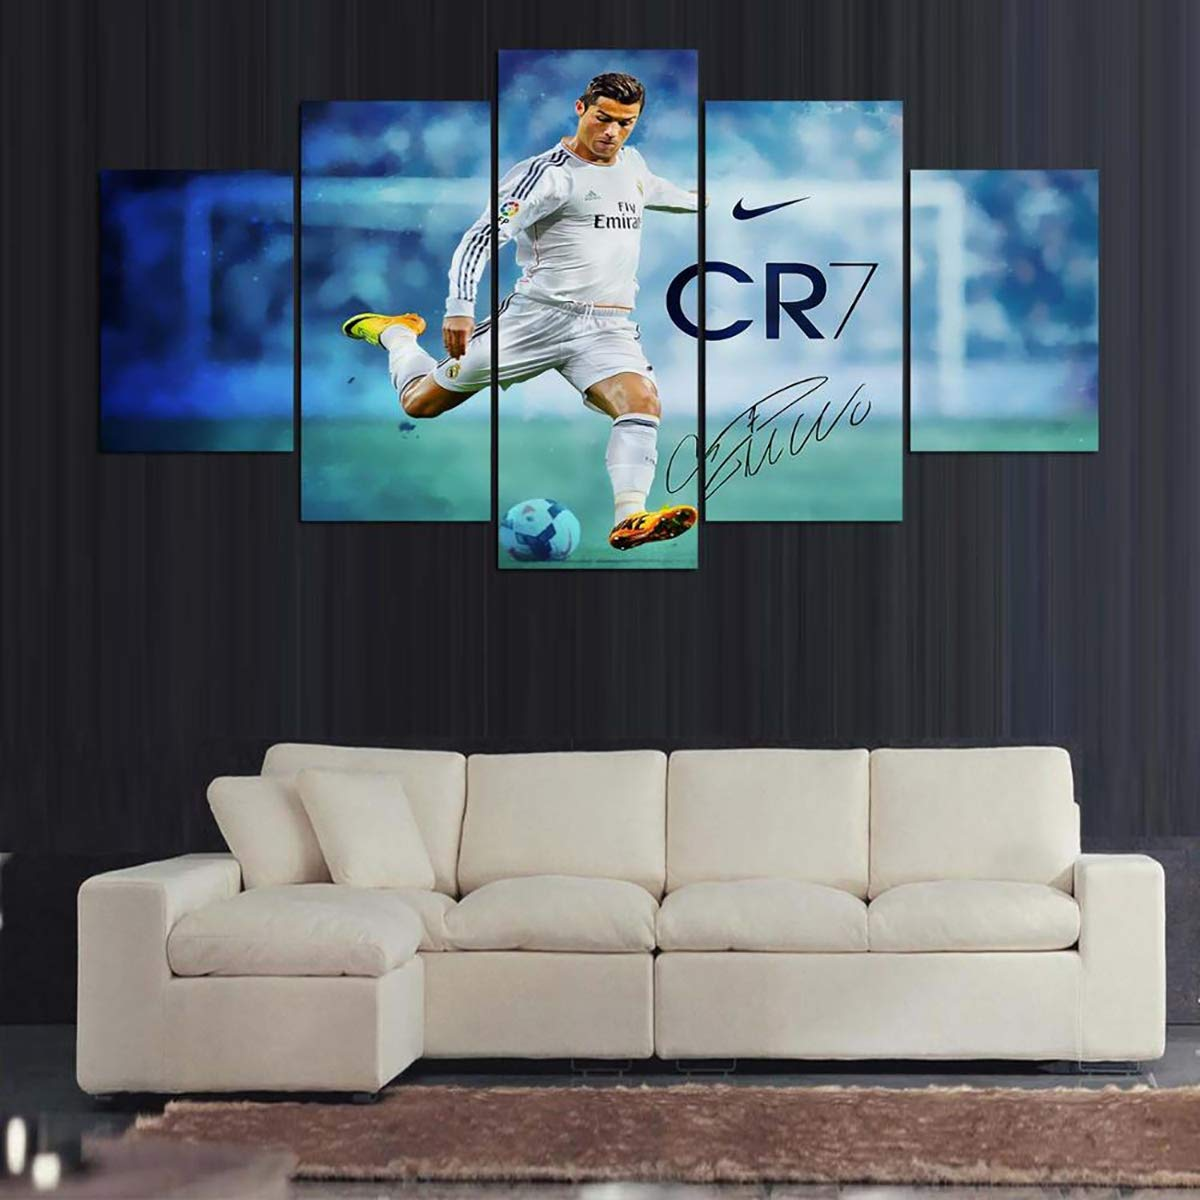 LHKAVE 5 Panel de Lona Impreso Real Madrid Ronaldo Pintura ...